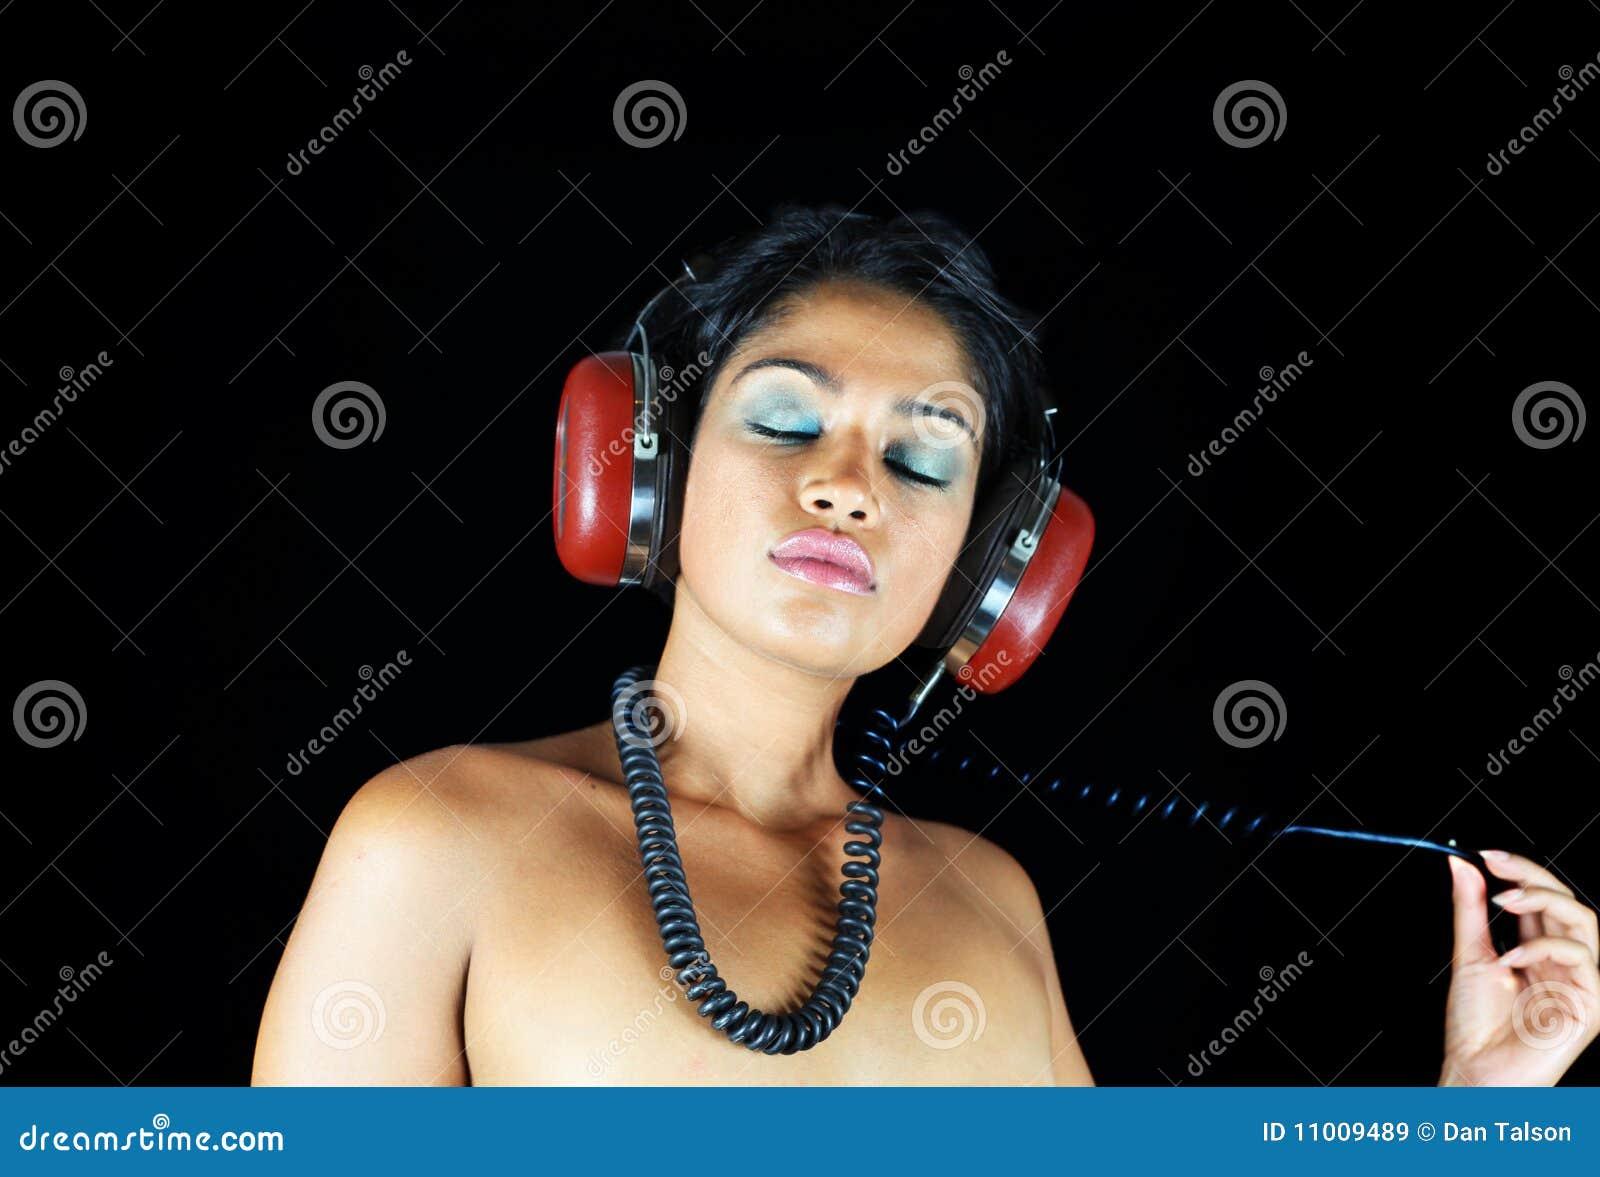 Headphone Girl Royalty Free Stock Images Image 11009489